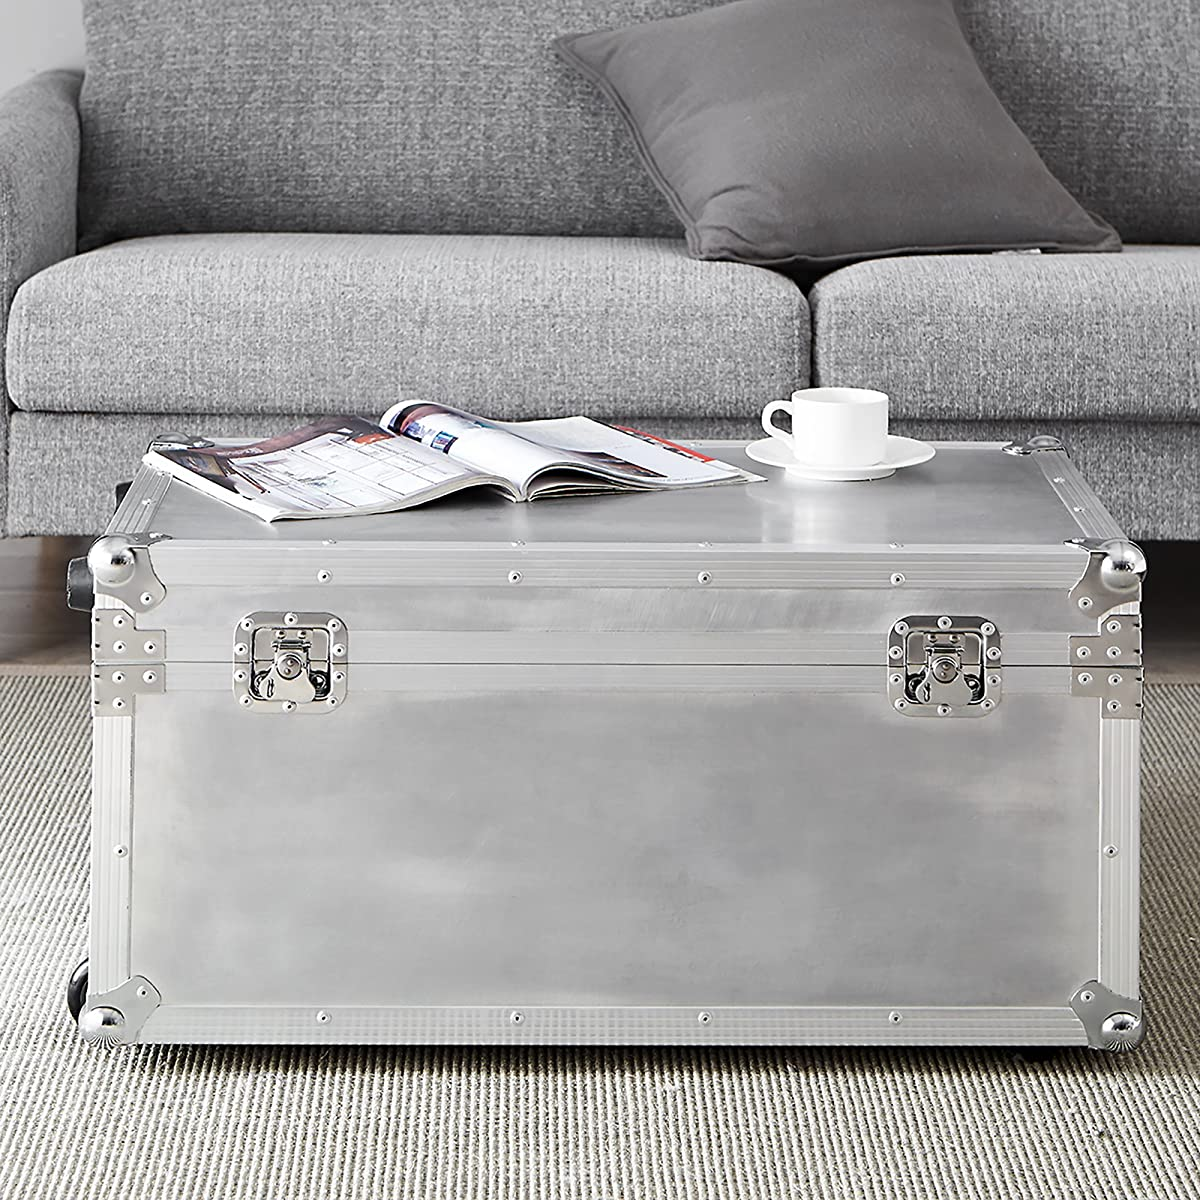 DormCo VIN Steel Plated Trunks - Argent Destination (Silver)